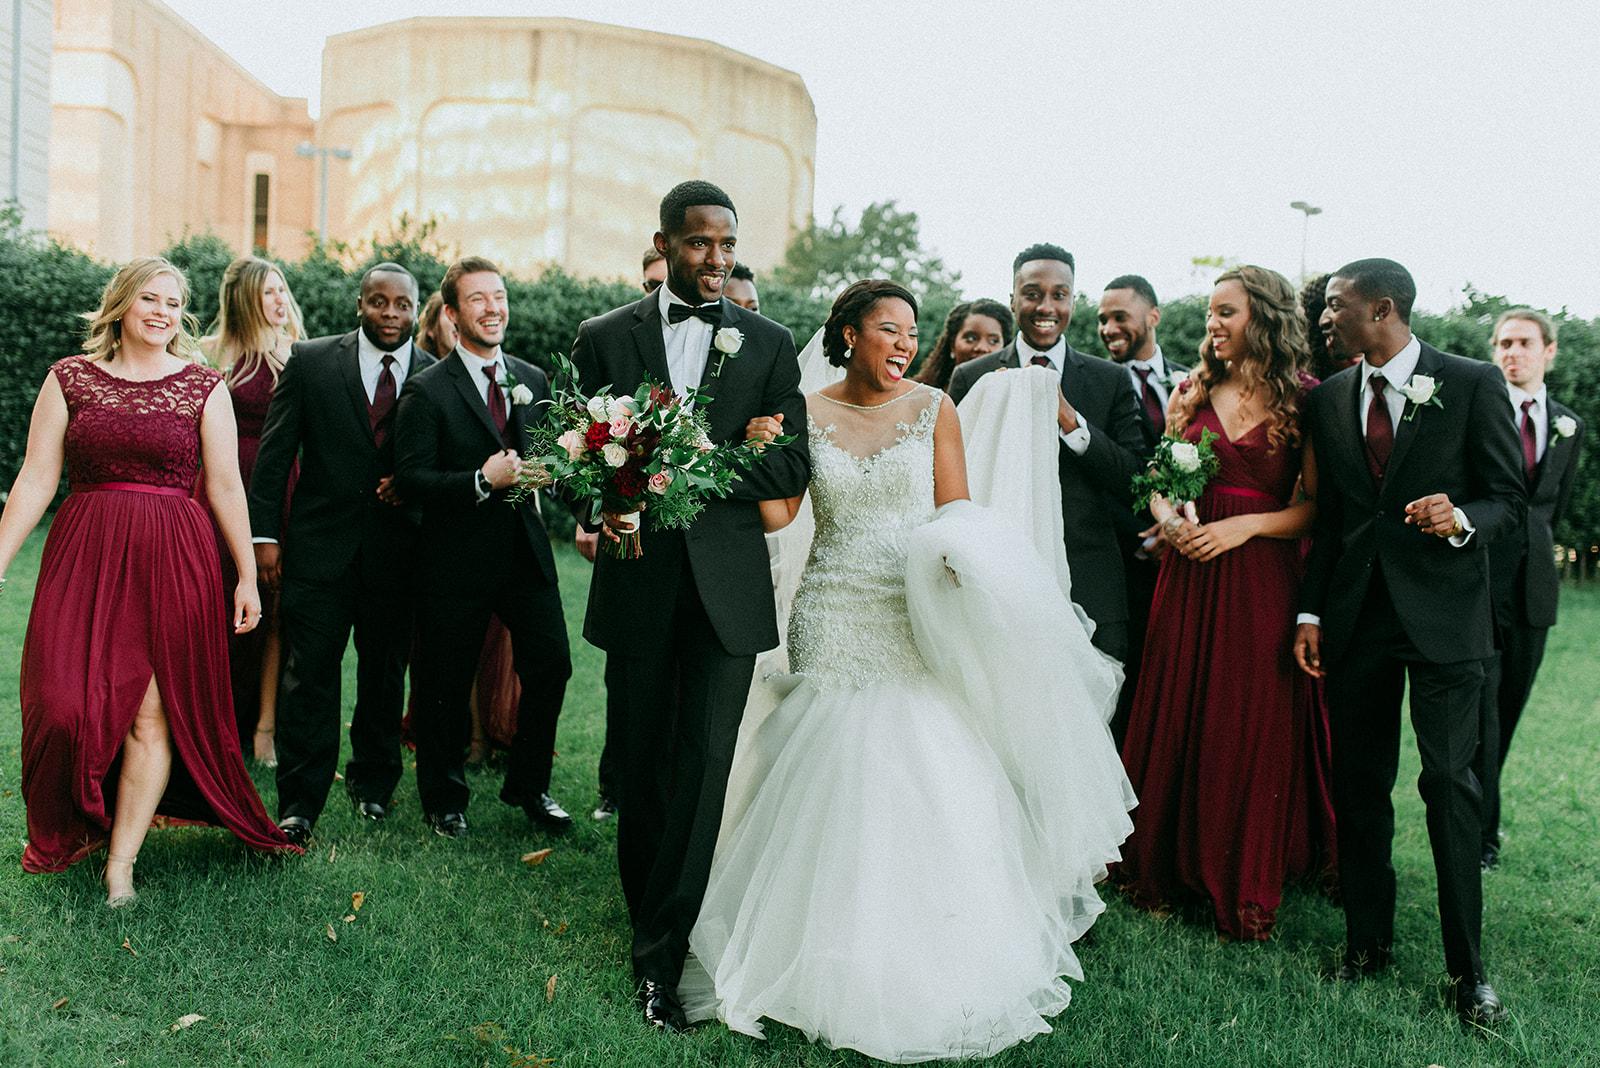 Industrial Allure: Real Wedding